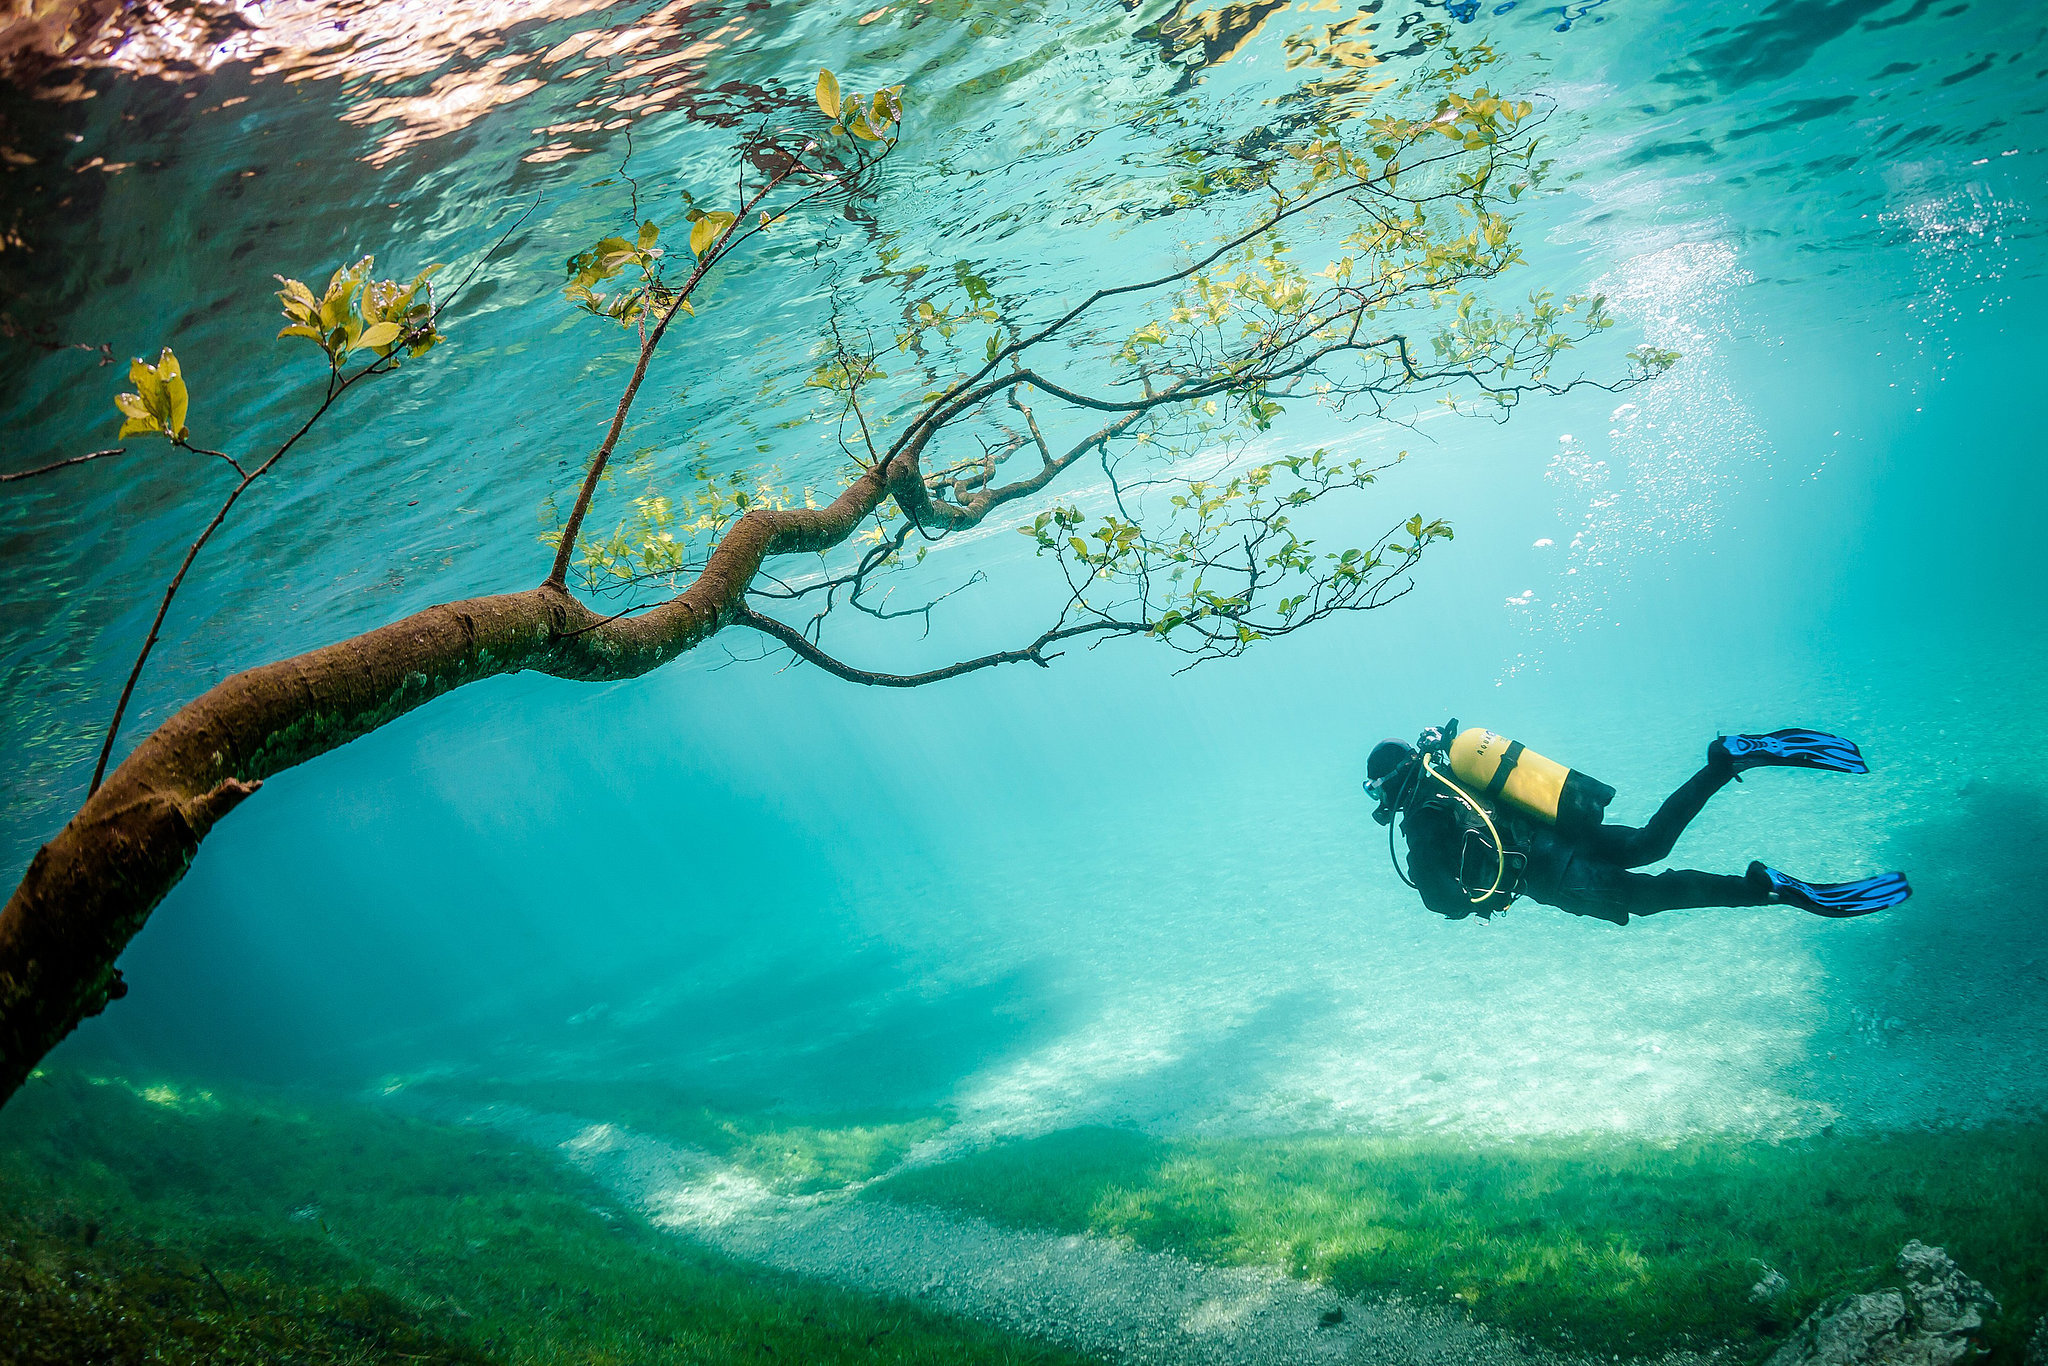 Third Place — Diver in Magic Kingdom